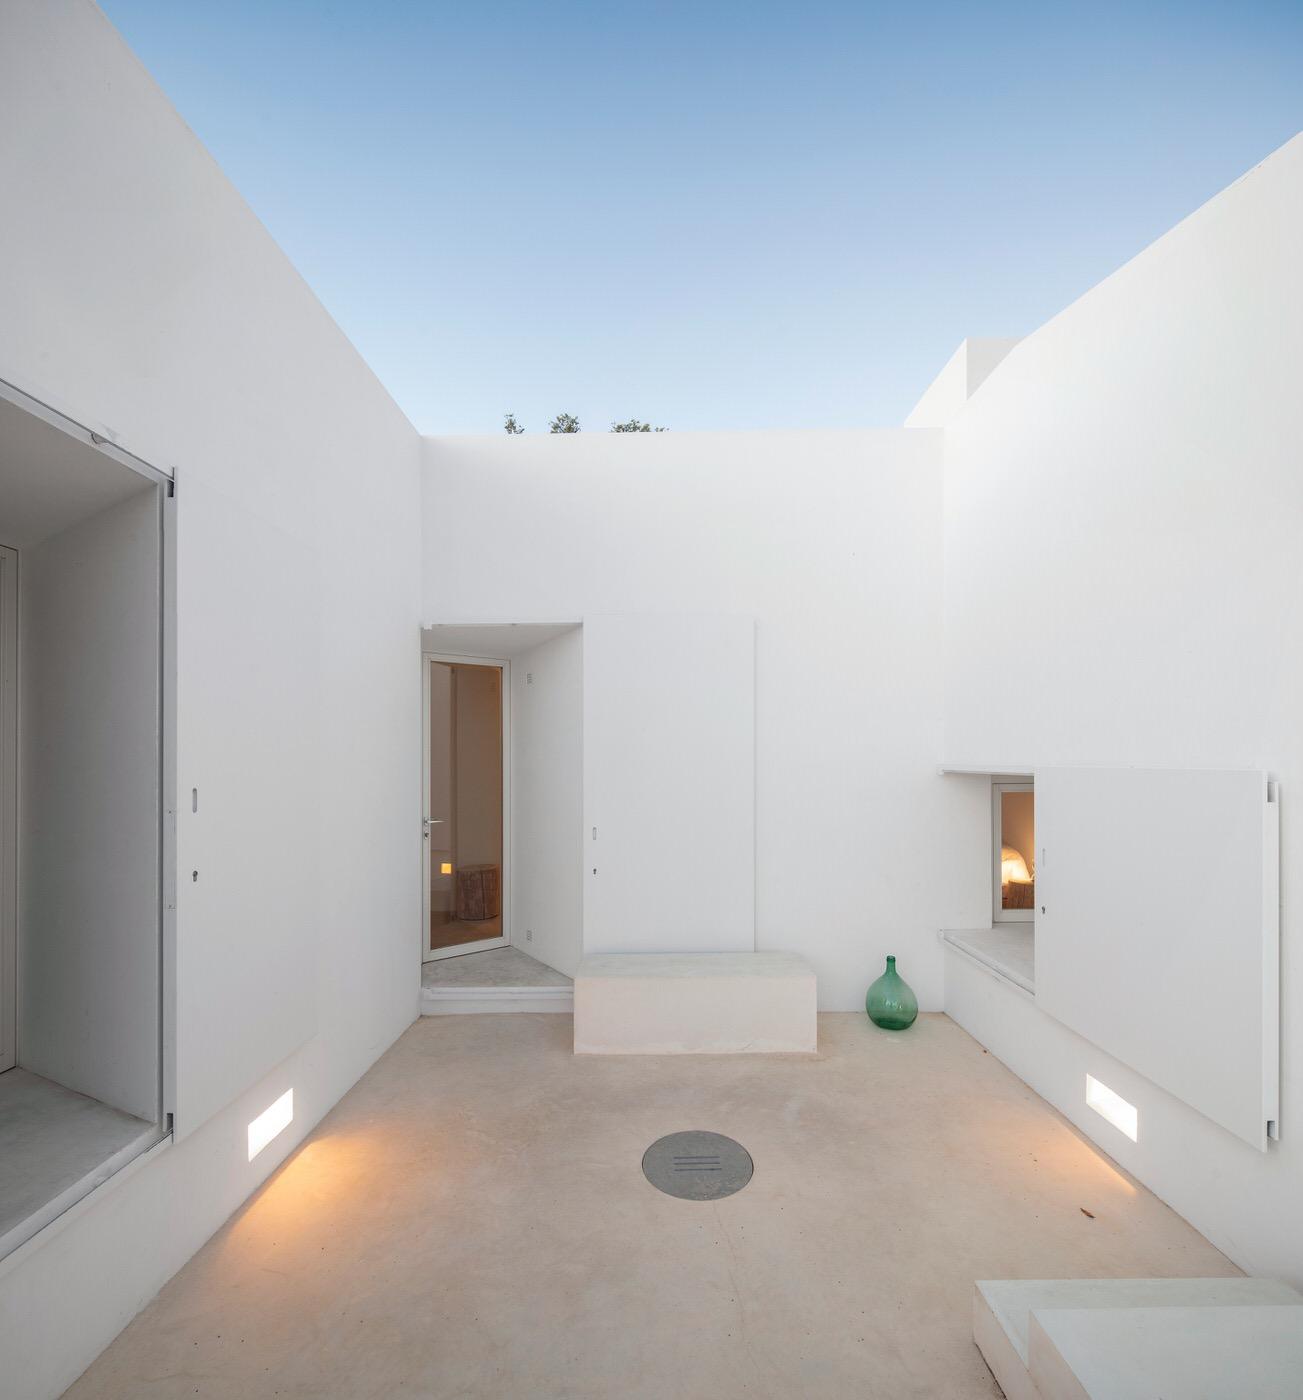 Zalig-Algarve-Casa-Luum-183-1